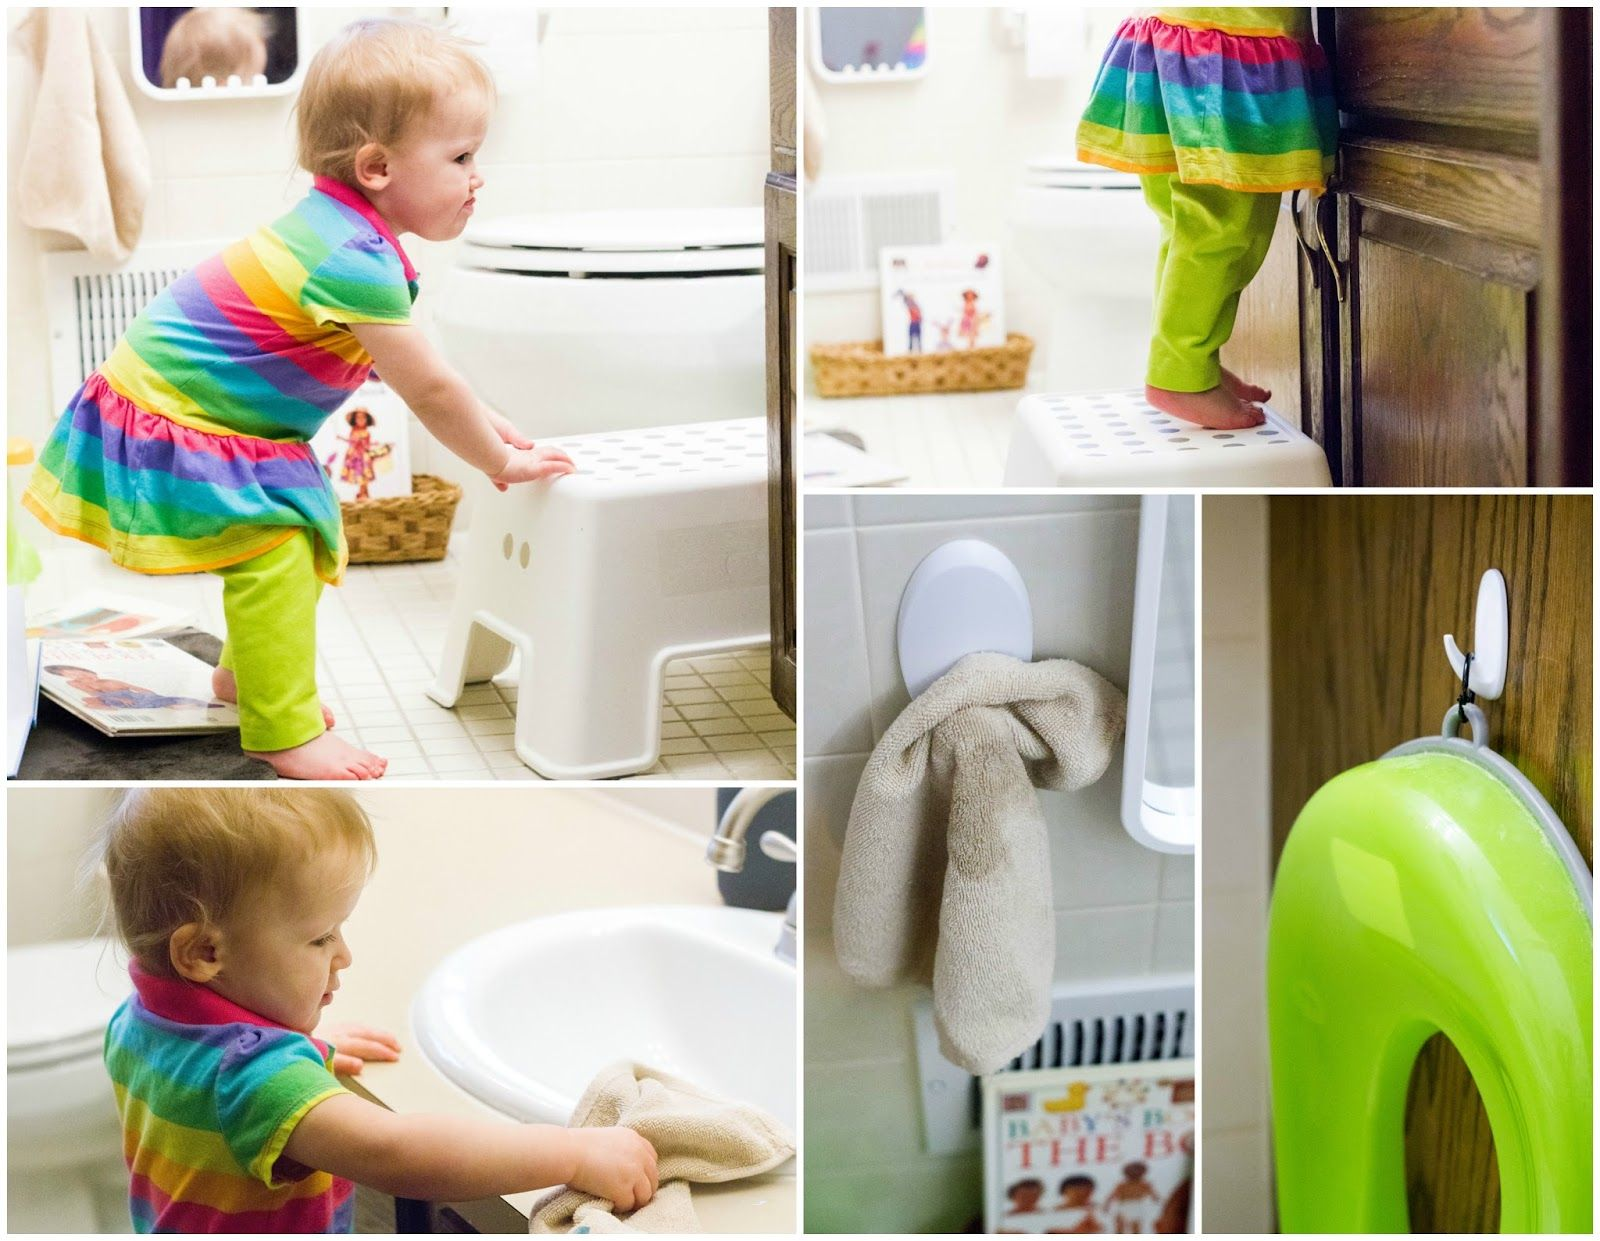 Montessori Home -- The Bathroom | Montessori, Practical life and ...